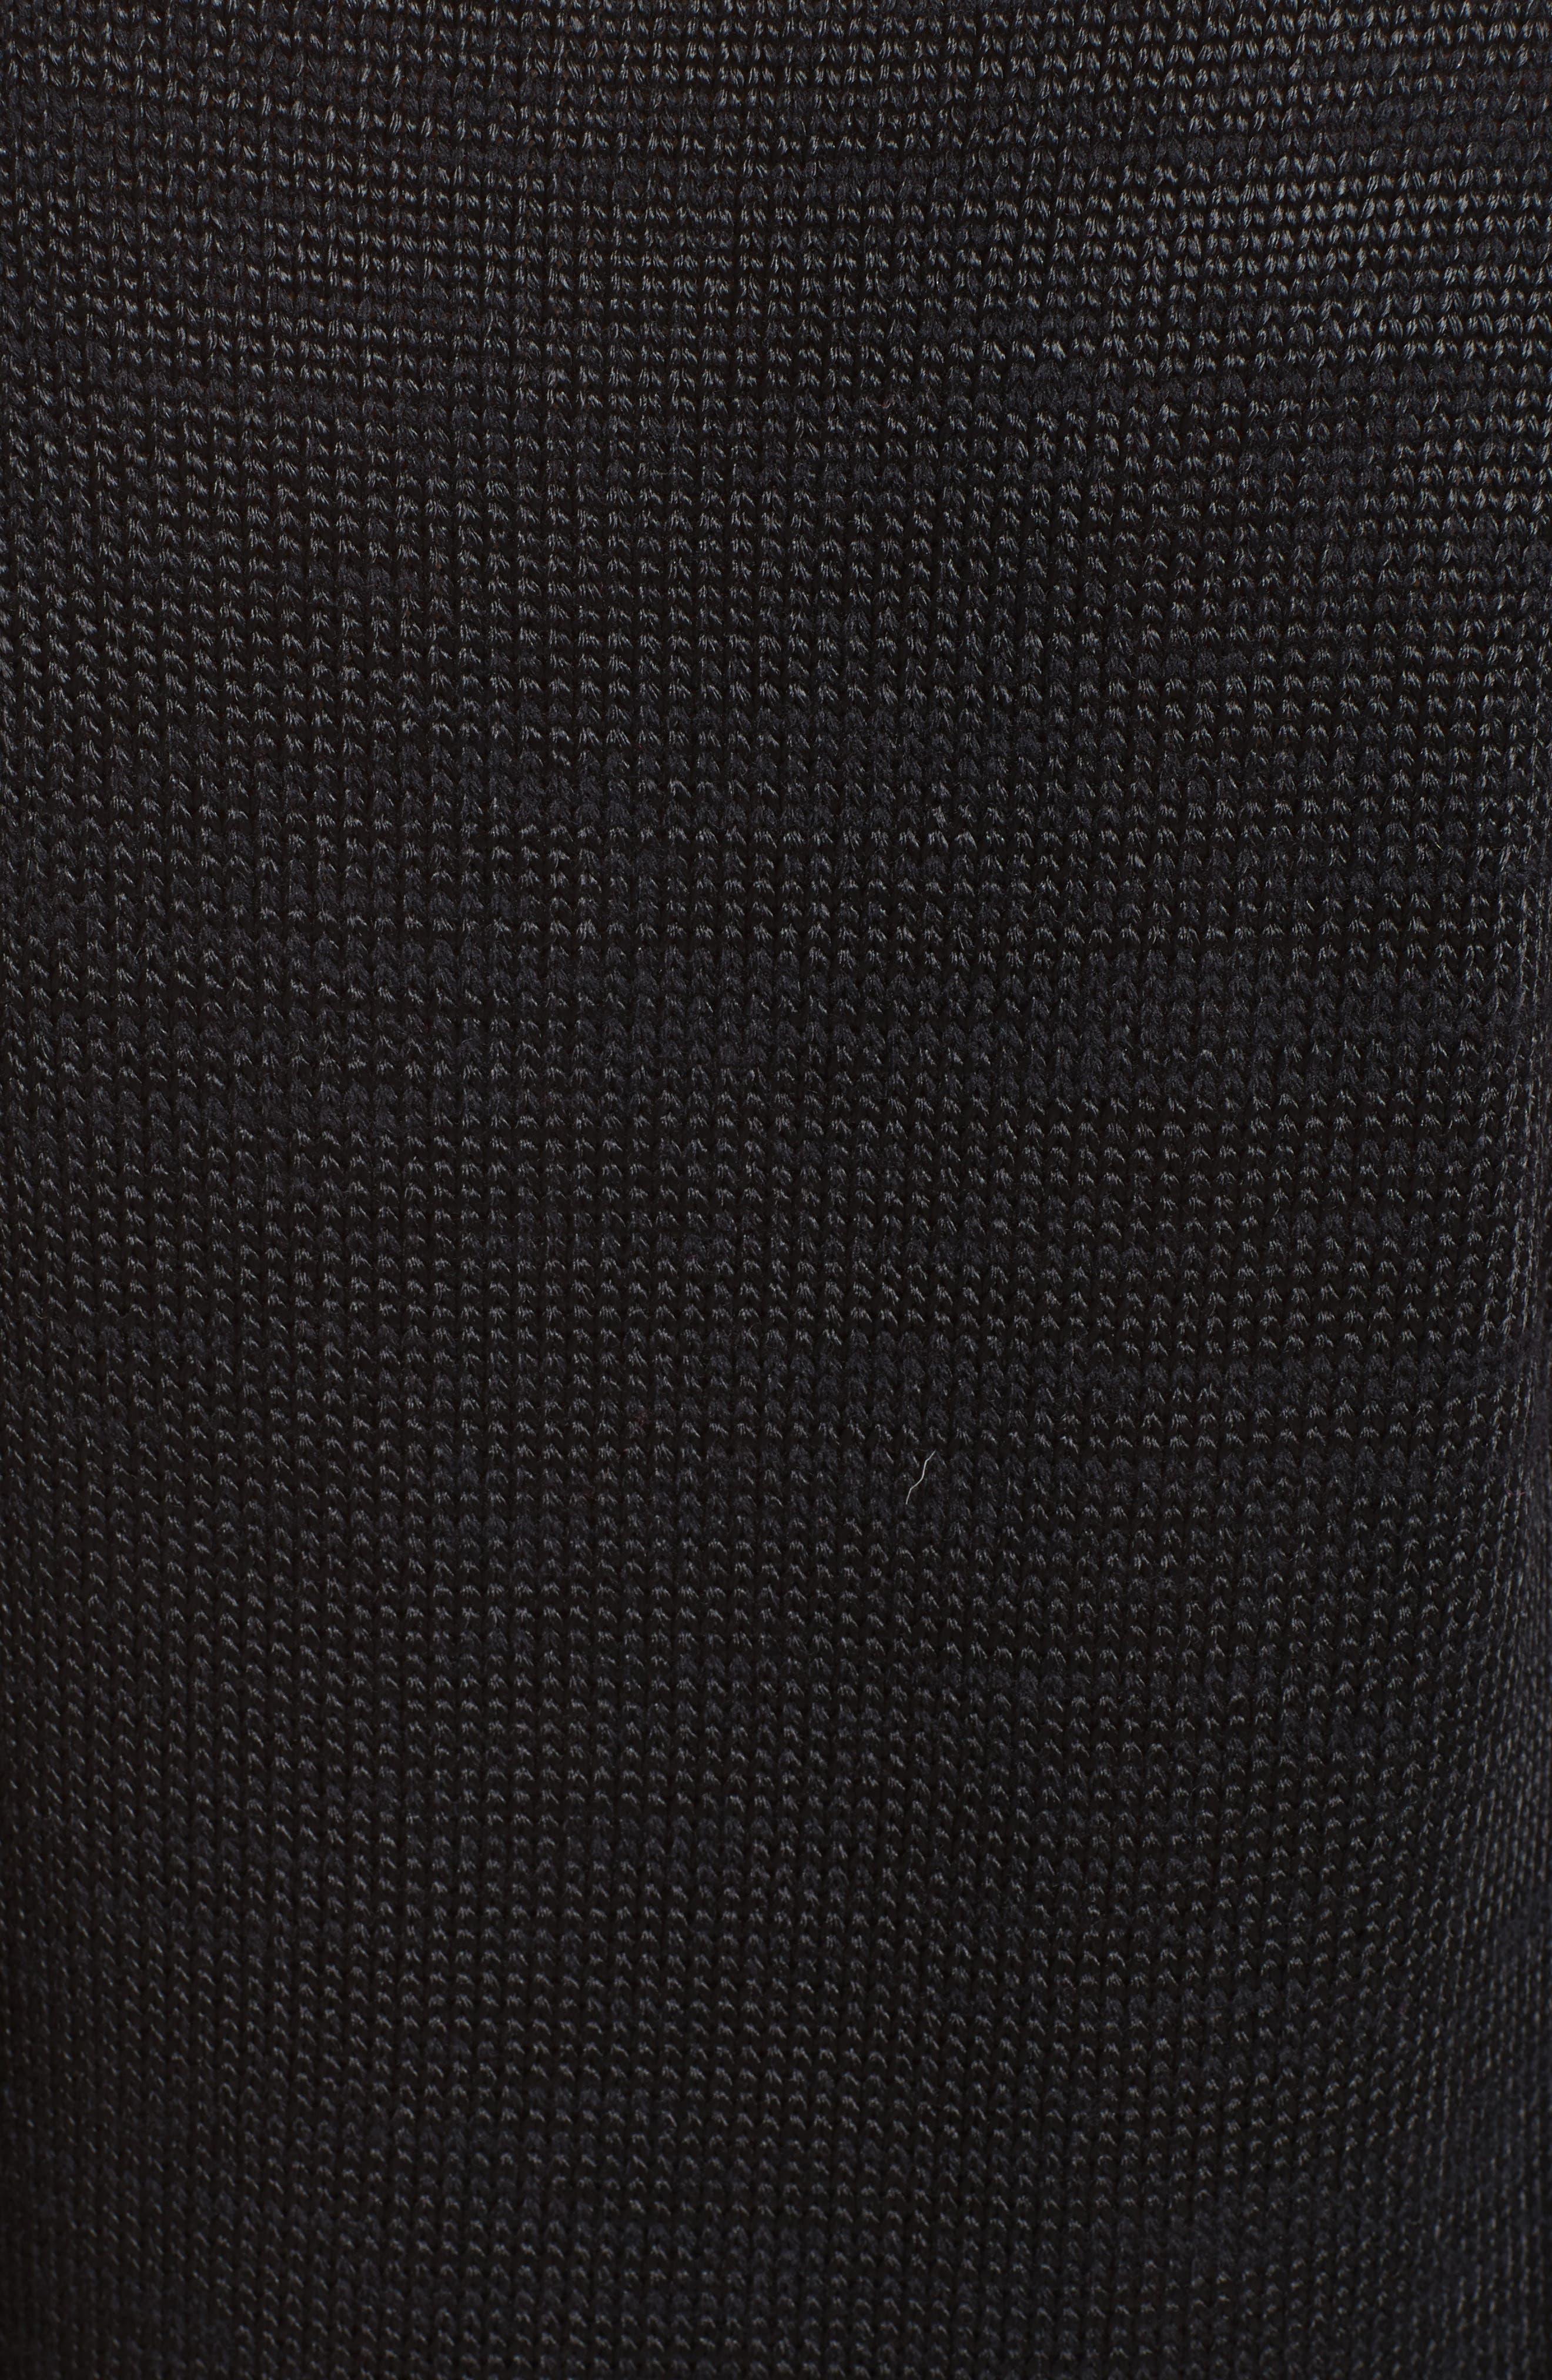 Alternate Image 3  - MARC JACOBS '80s Stripe Knit Wool Sweater